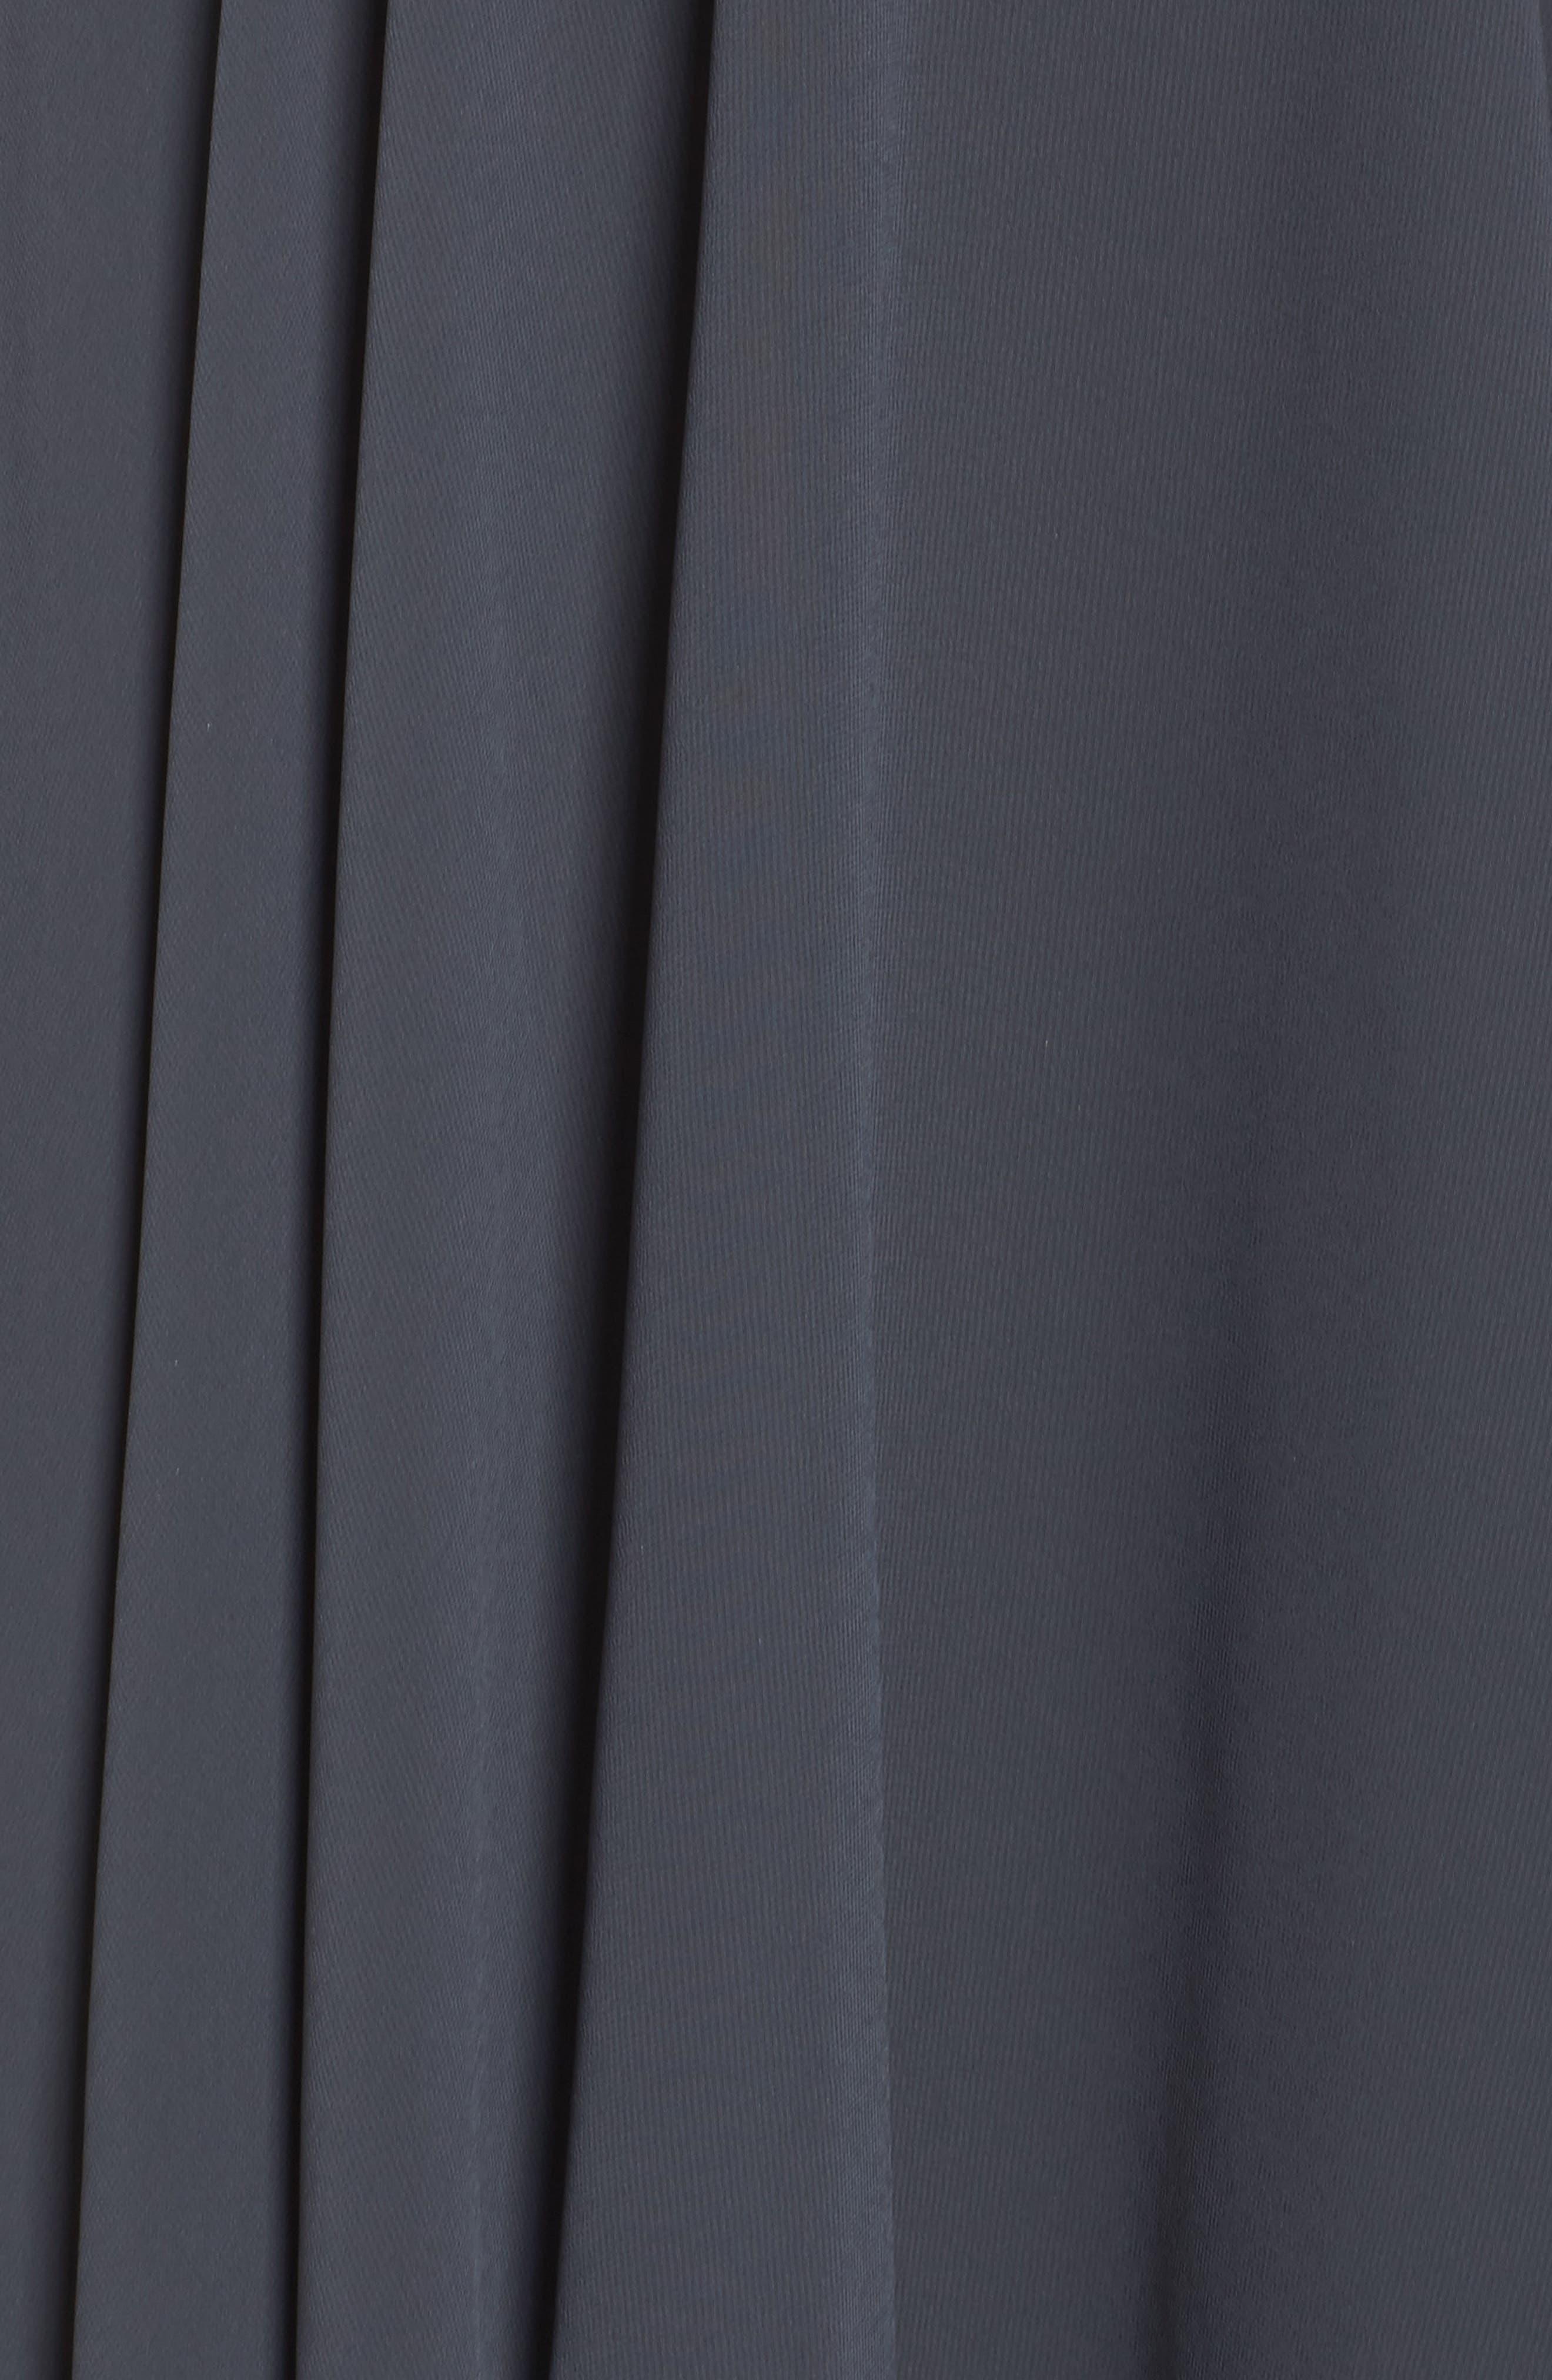 JENNY YOO,                             Sienna Chiffon Dress,                             Alternate thumbnail 5, color,                             026